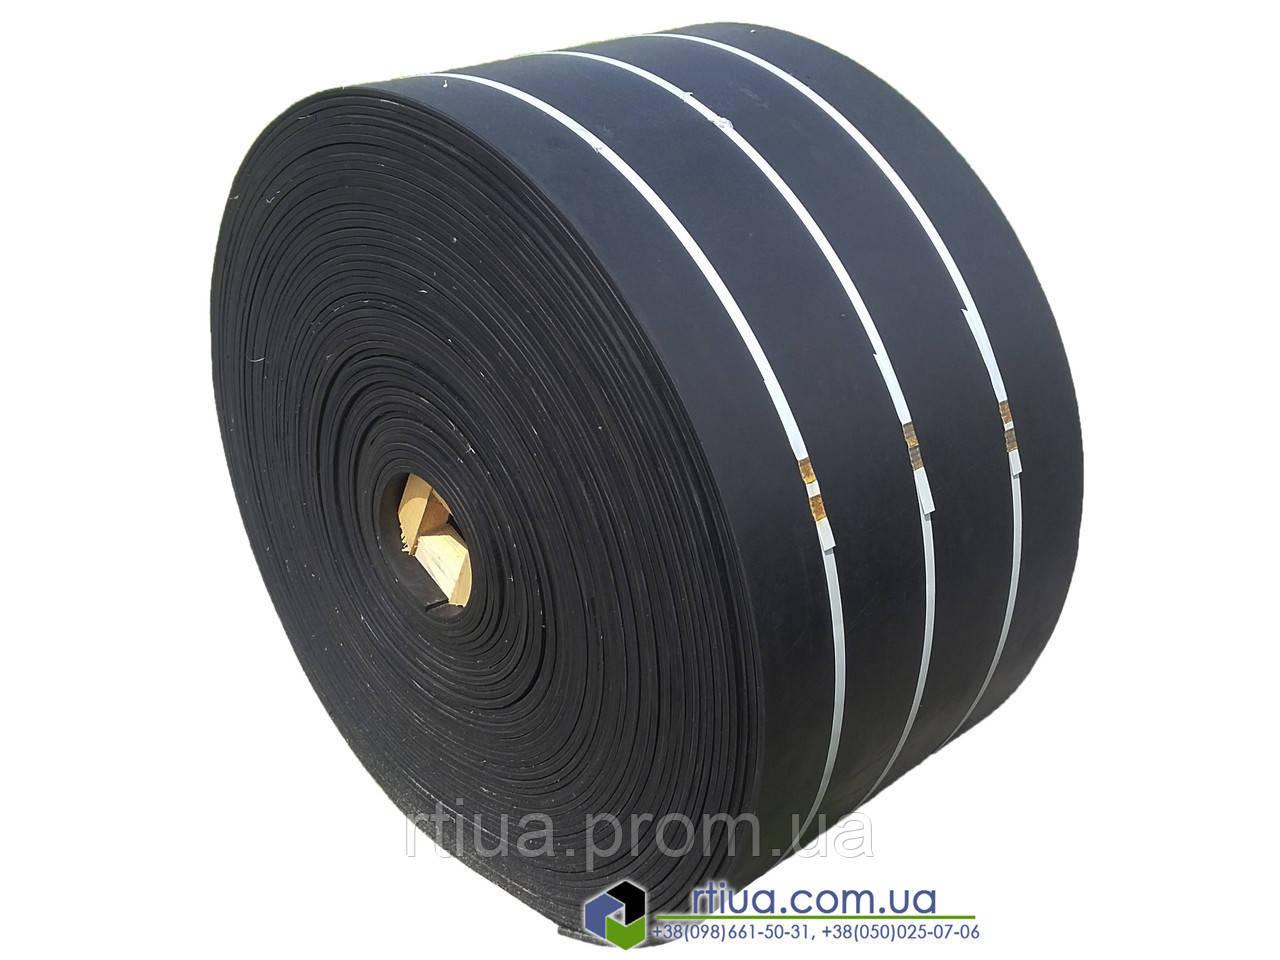 Конвейерная лента 1000х11 мм